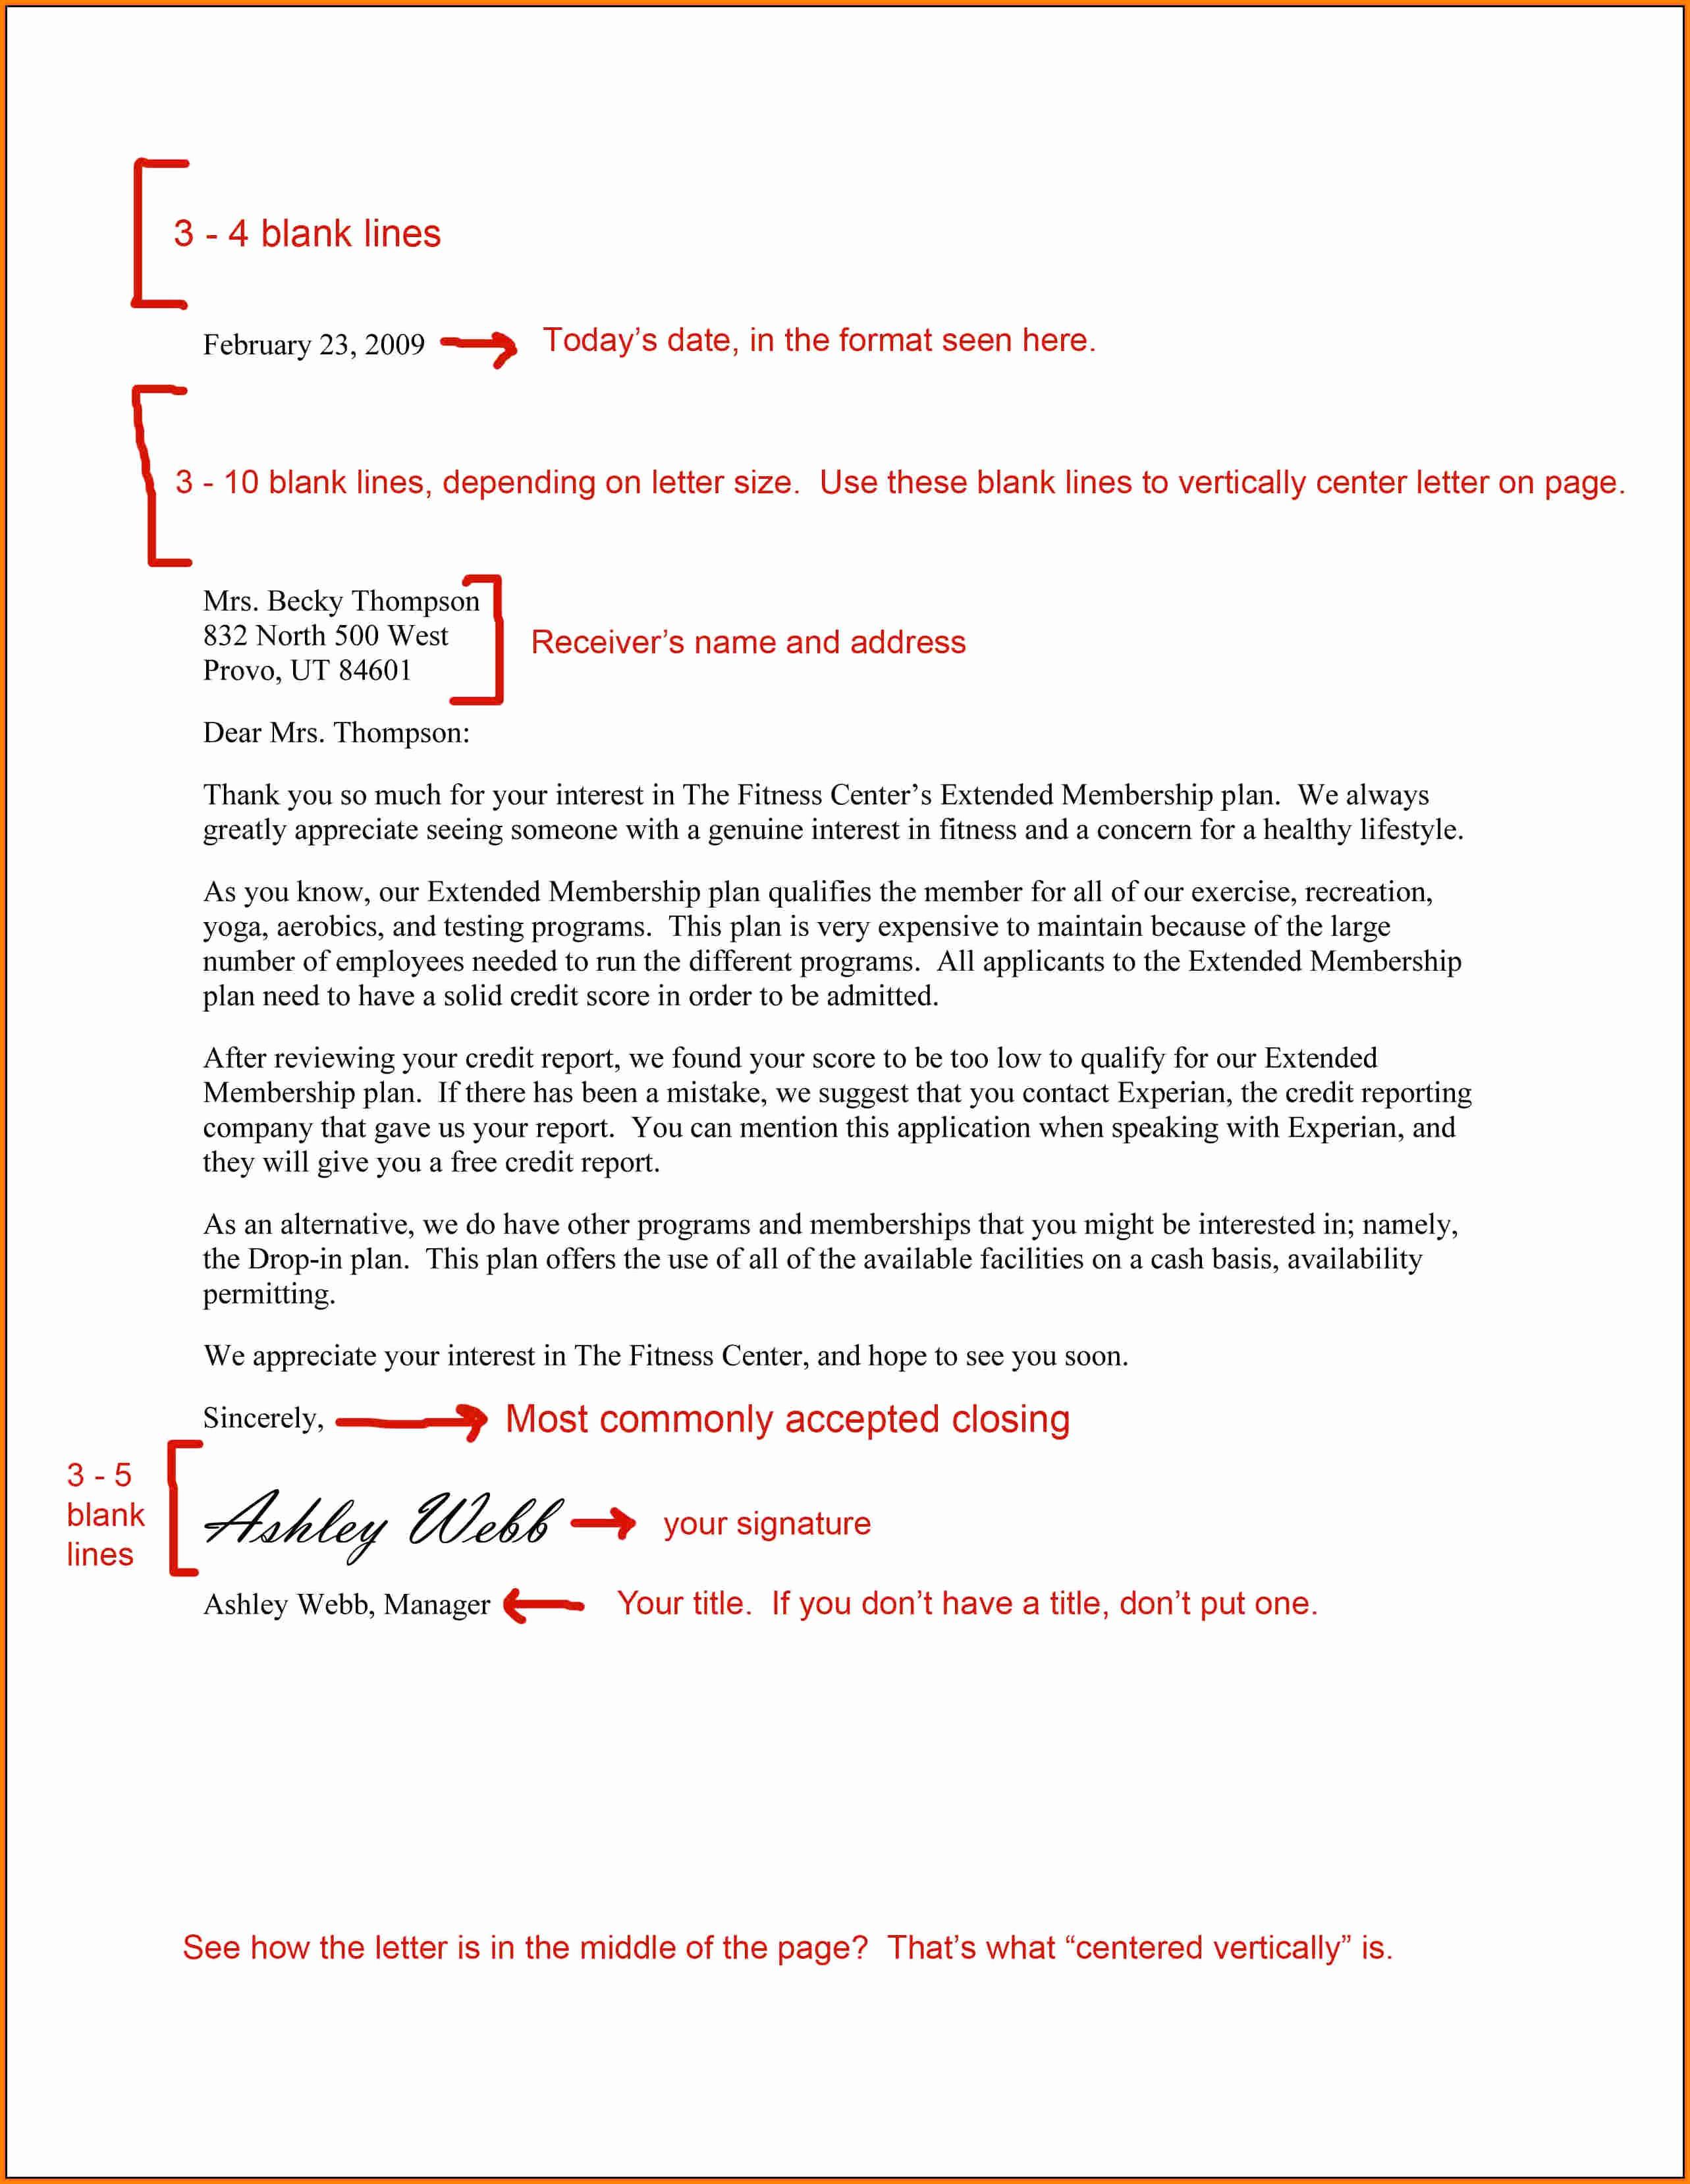 Sample Of Buisness Letter New Image Result for Business Letter